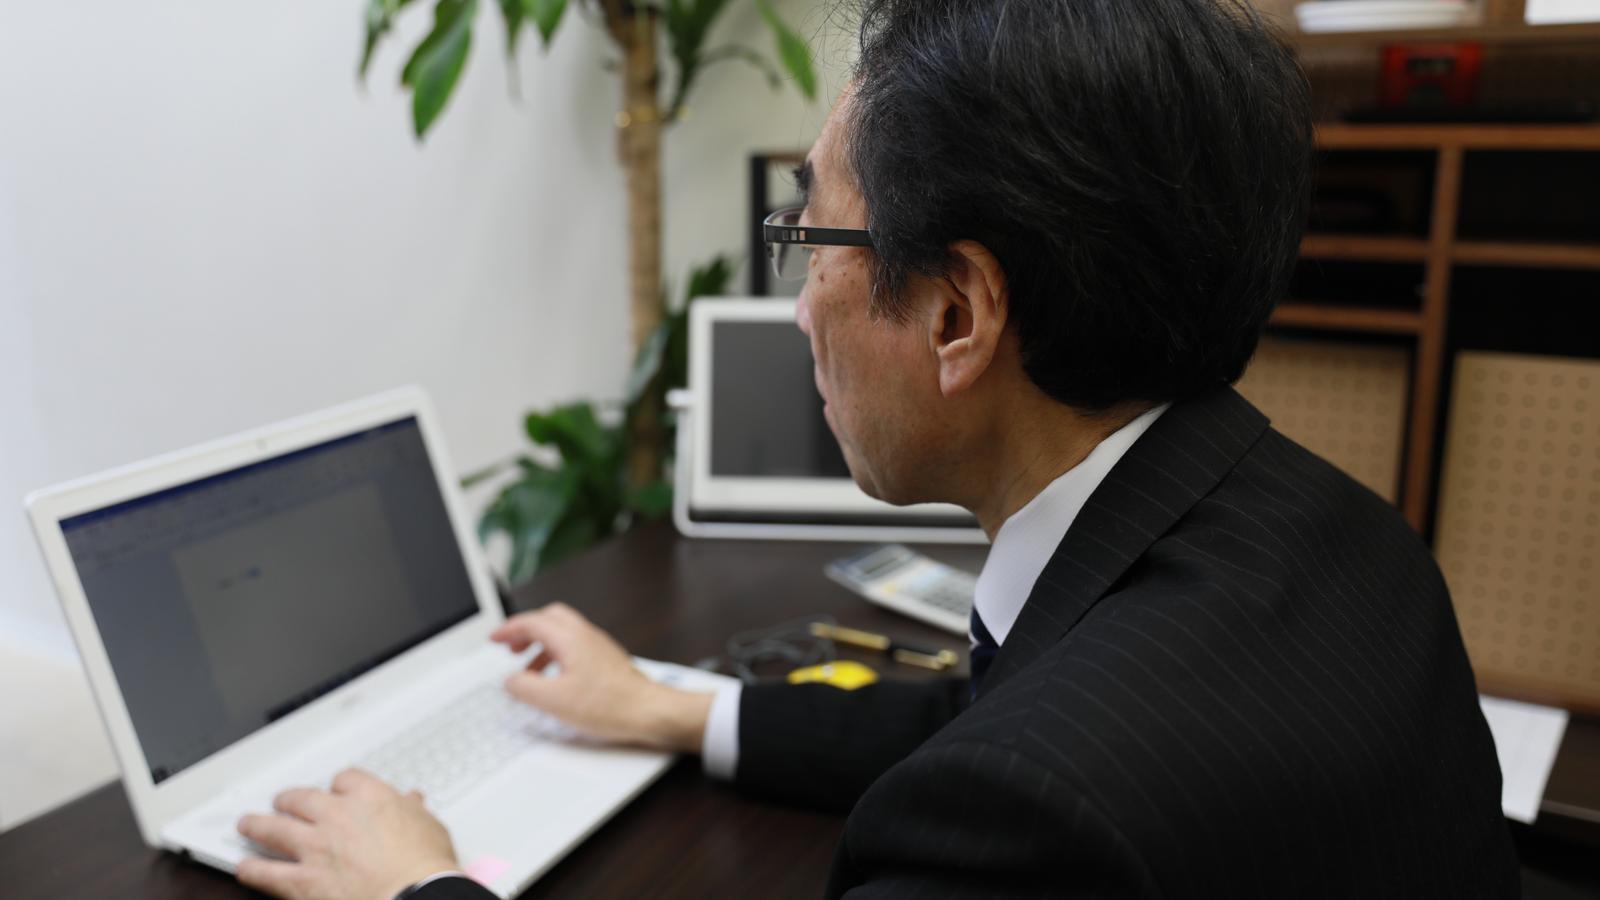 Akiyoshi-MBJ_6415.JPG